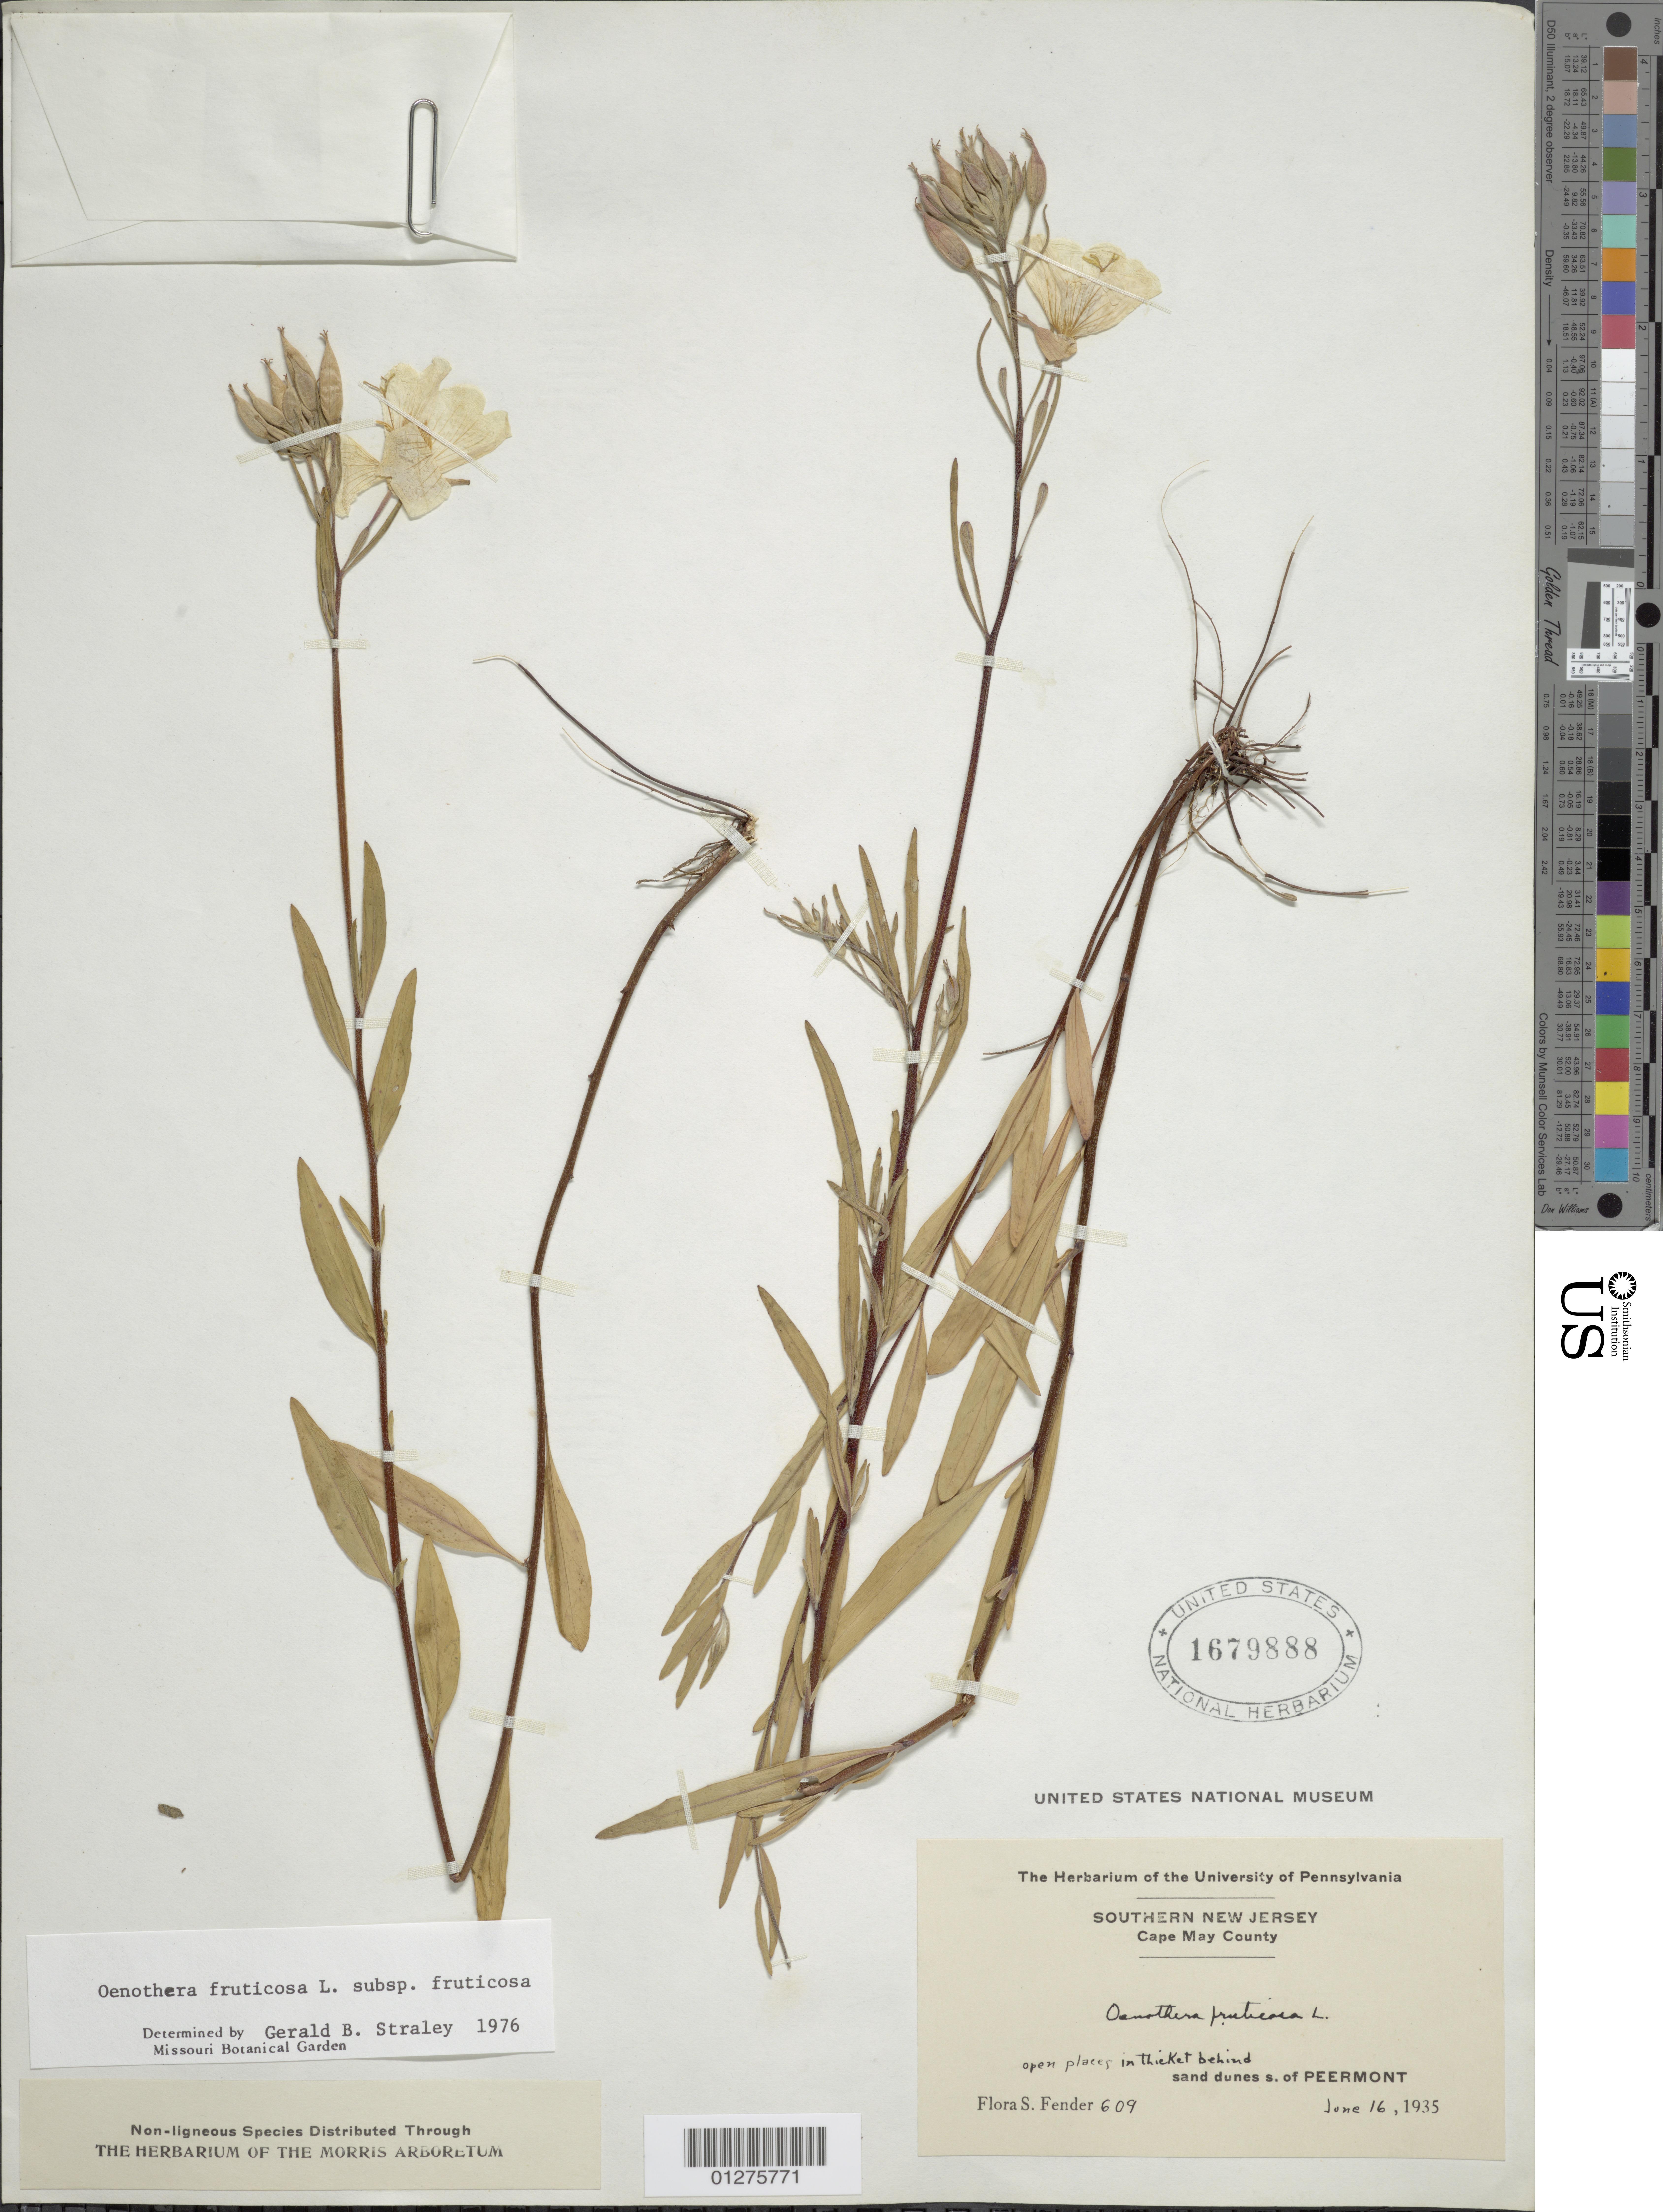 Image of narrowleaf evening primrose